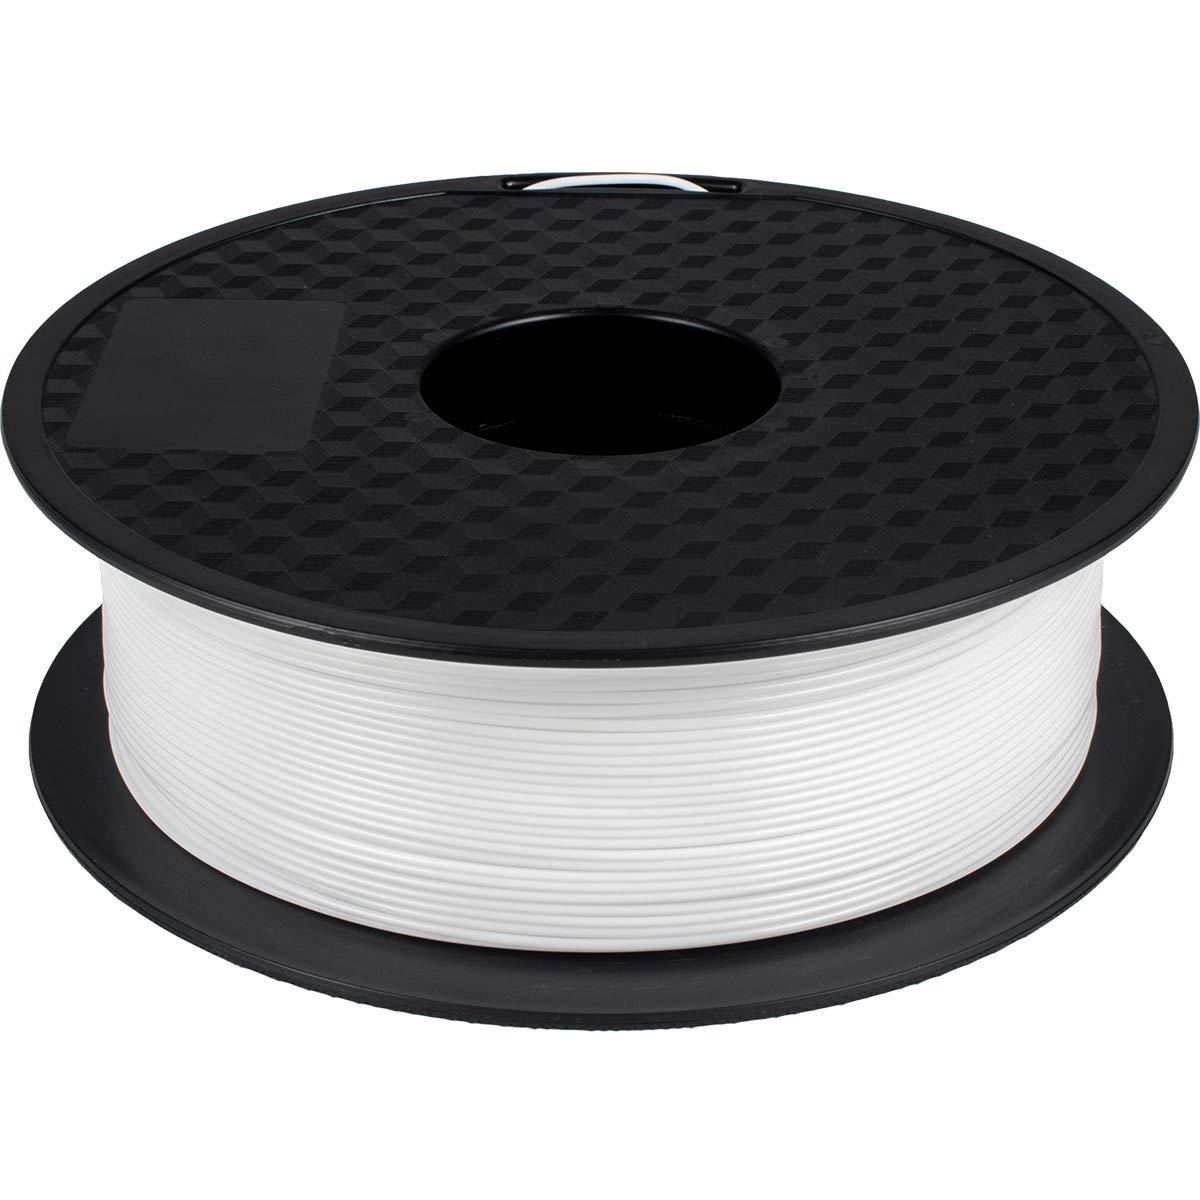 filamento de impresora 3D PLA 1kg Carrete ... GEEETECH Filamento PLA 1.75mm Nuevo blanco